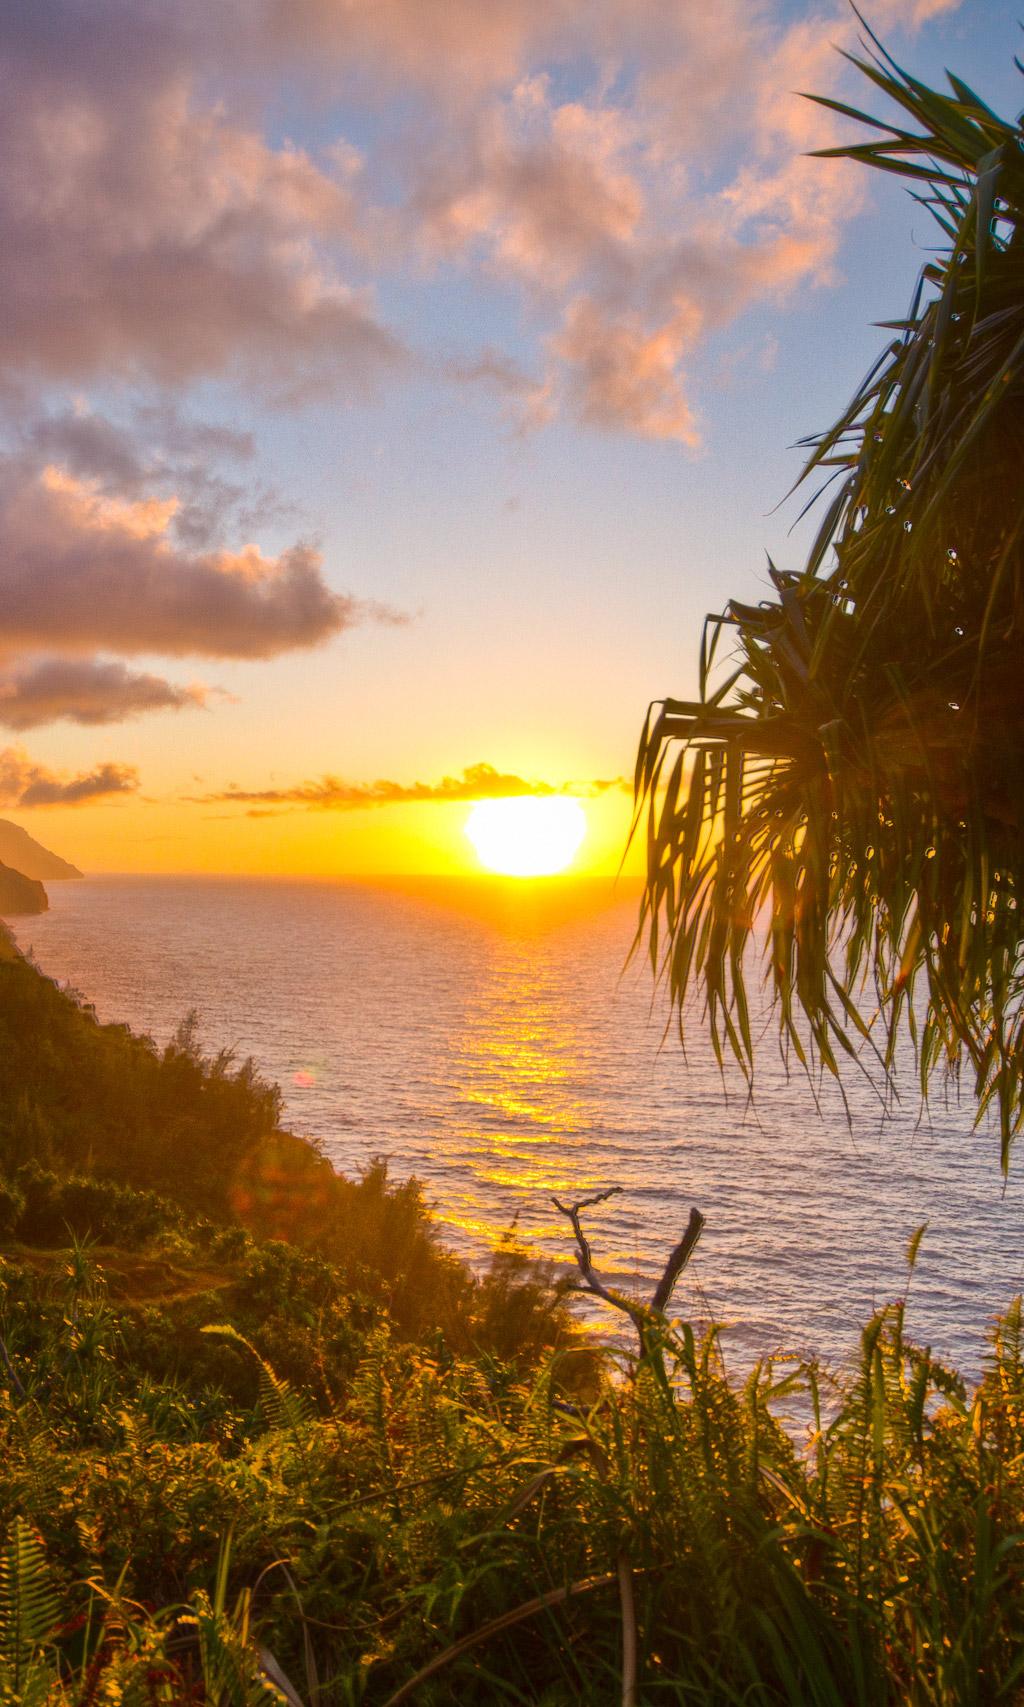 Fondo de pantalla semanal puesta de sol en kauai haw i for Fondo del sol